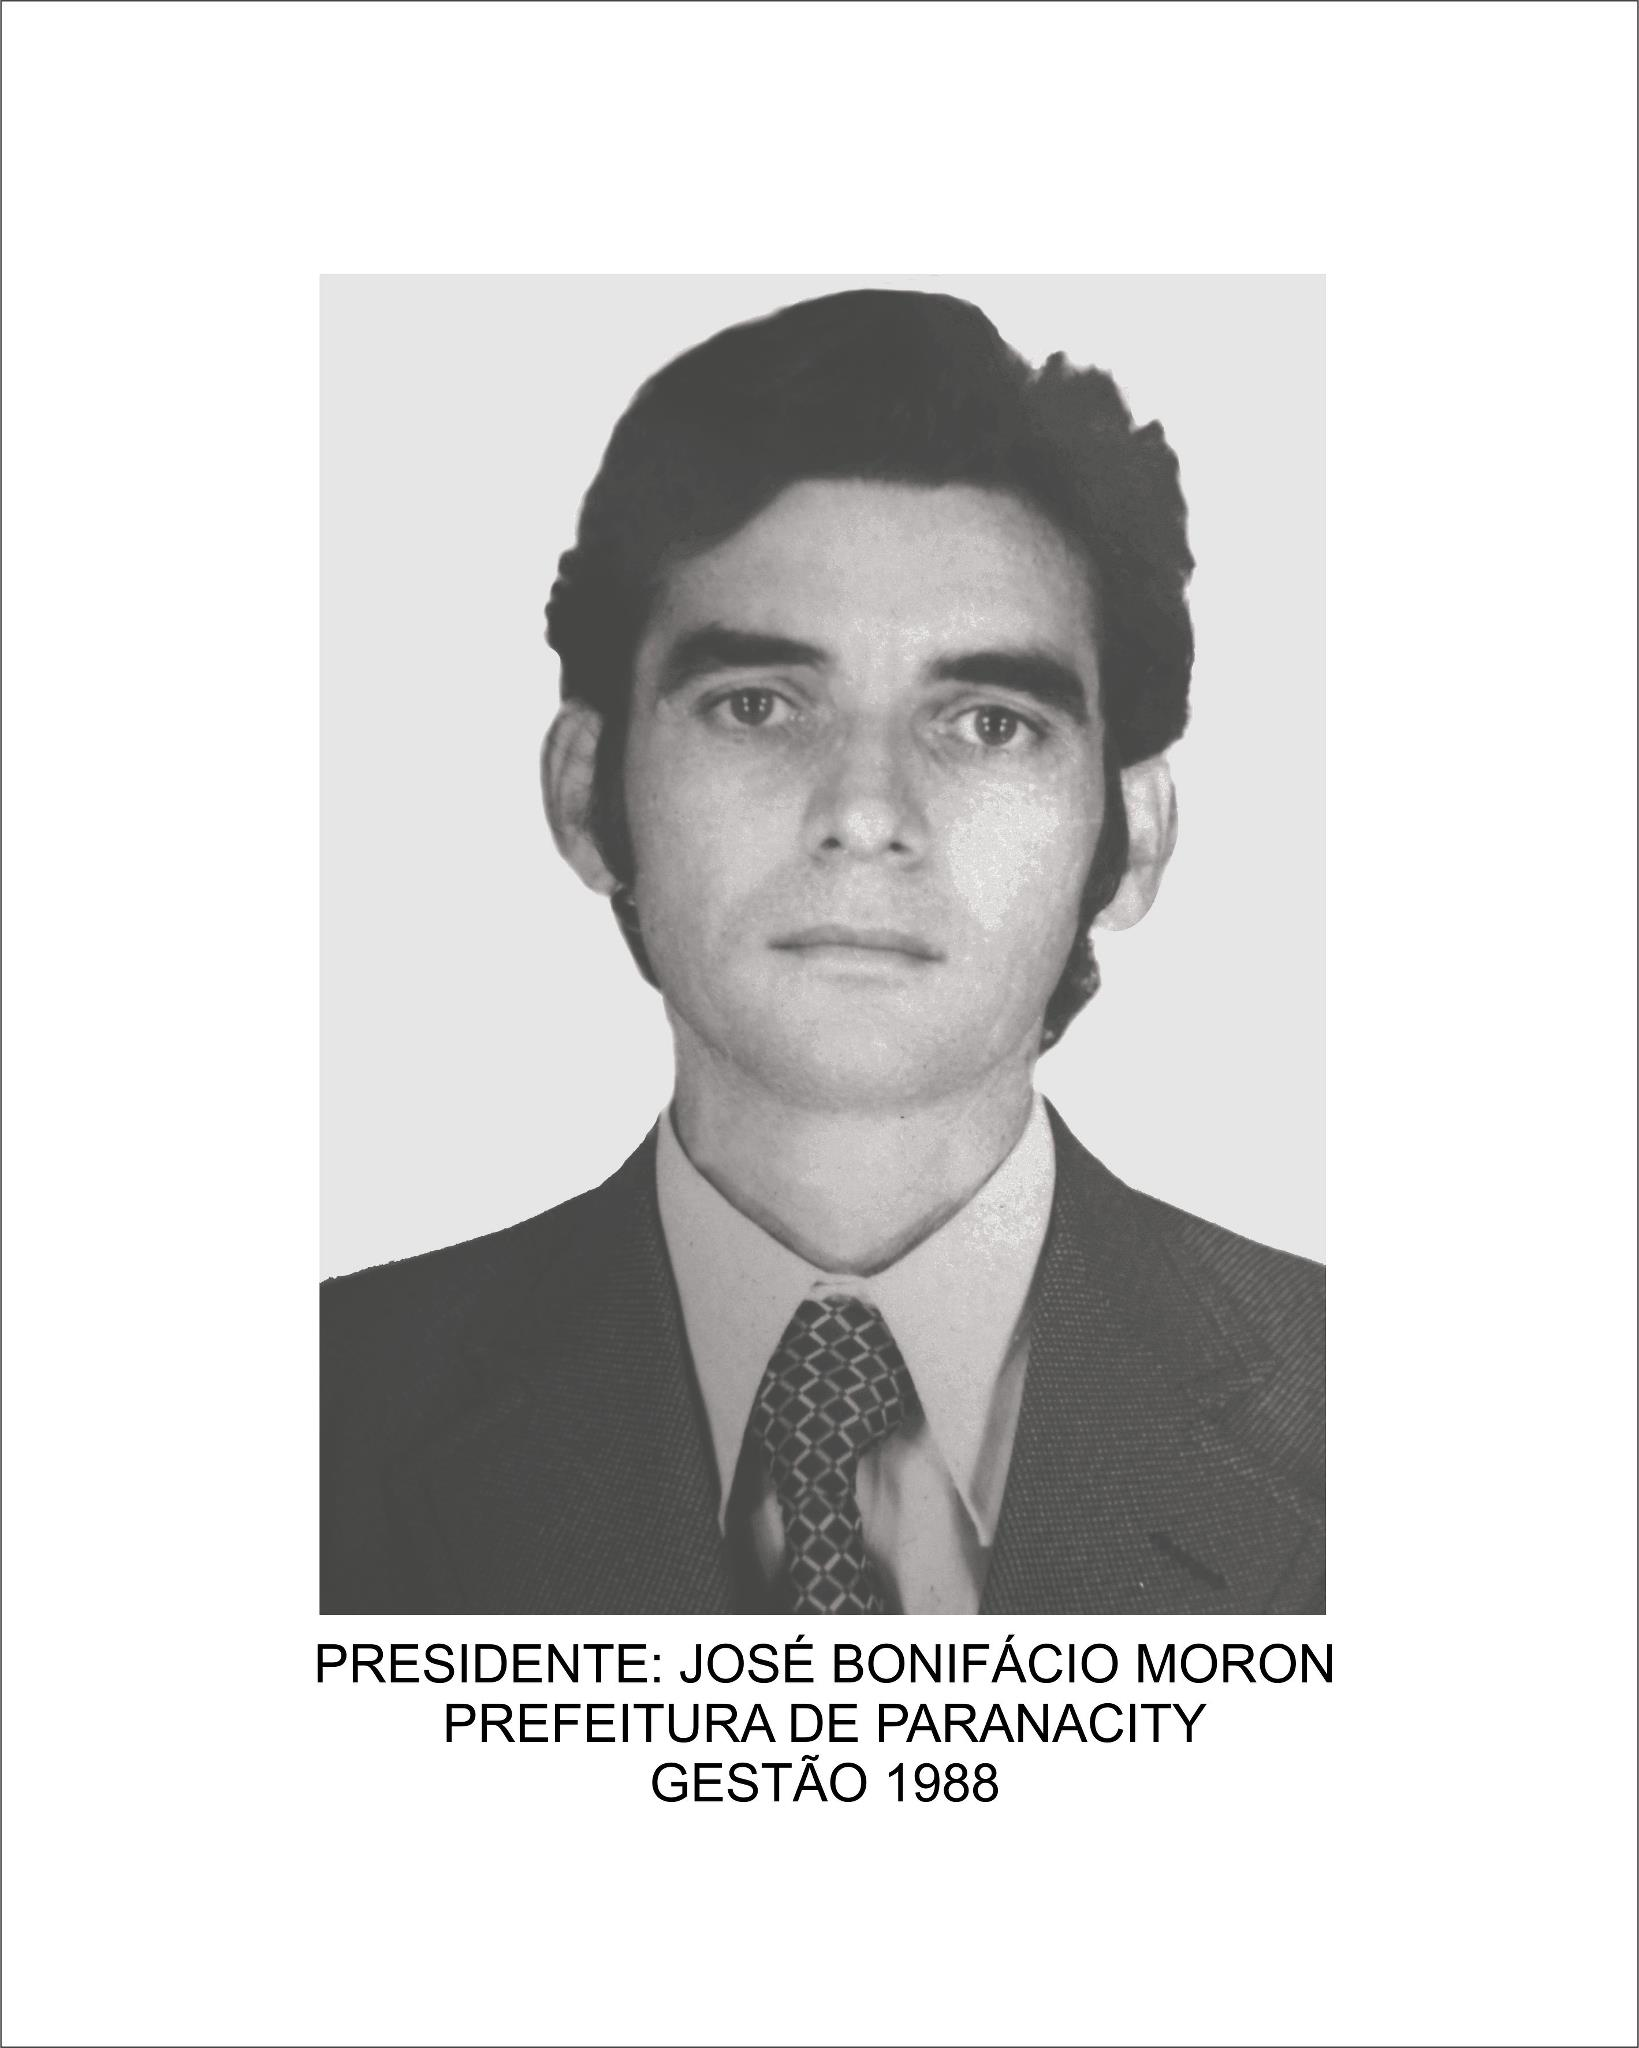 José Bonifácio Moron